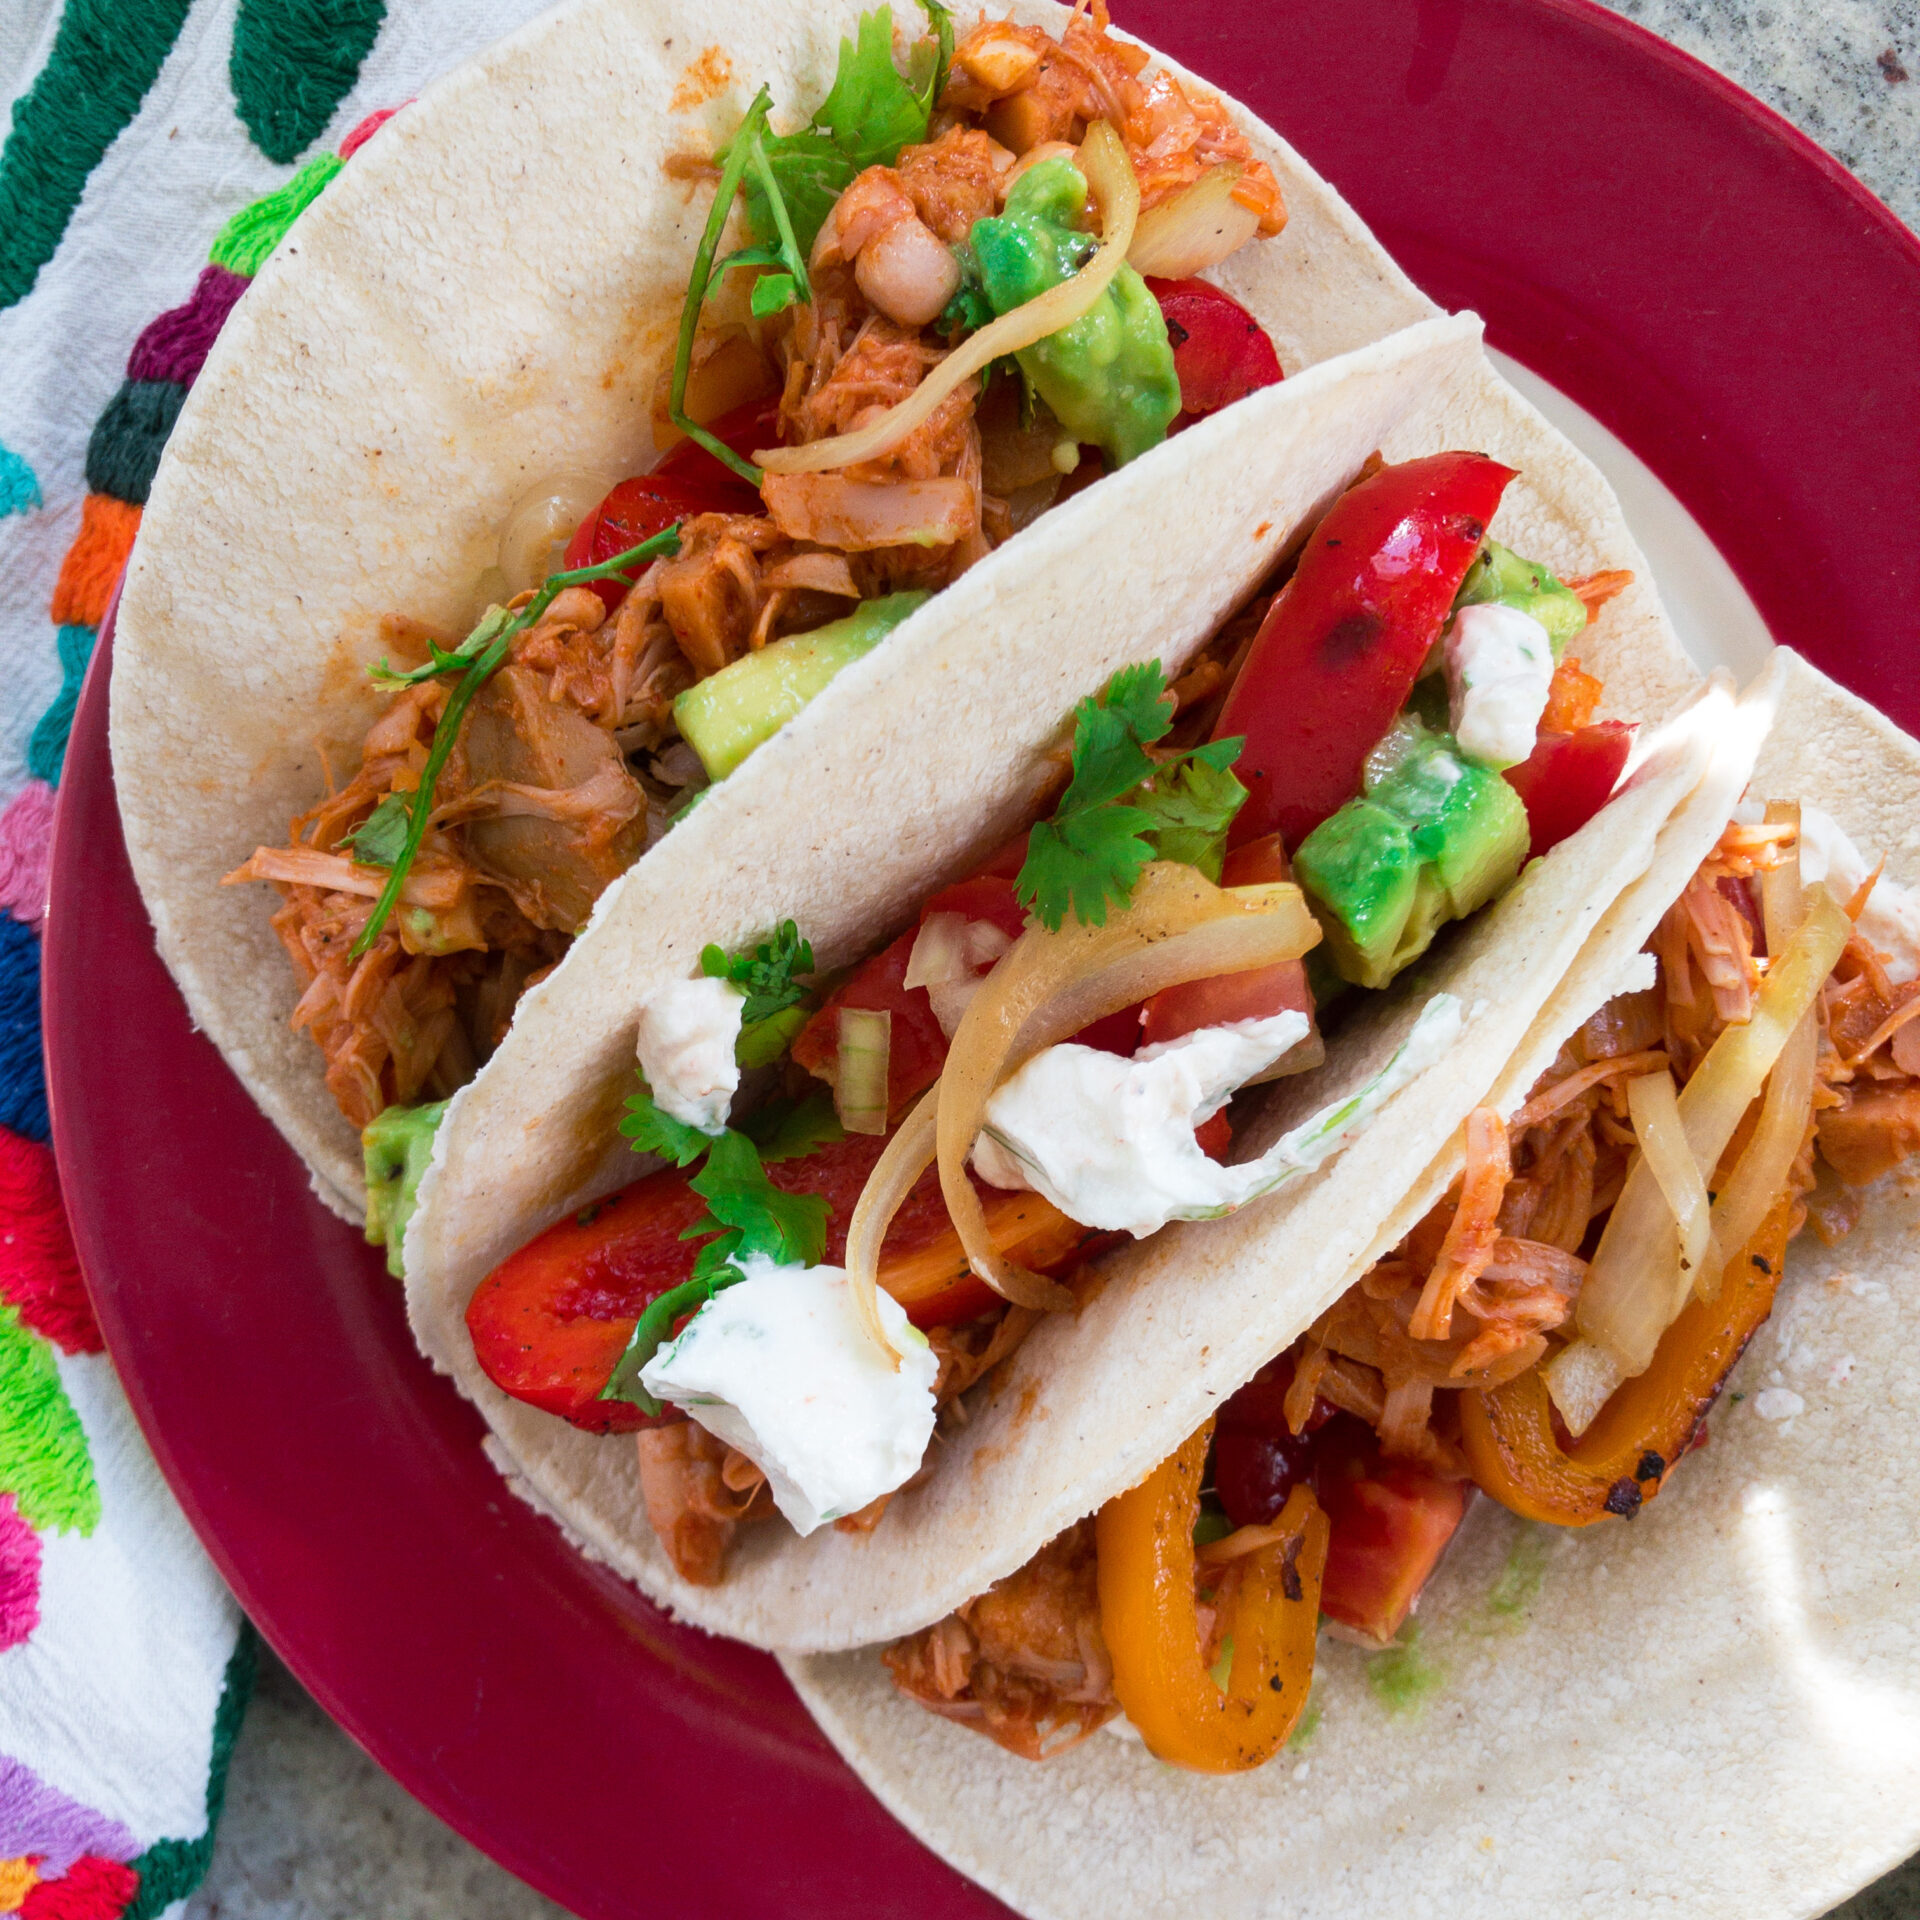 Tacos mit Jackfrucht square